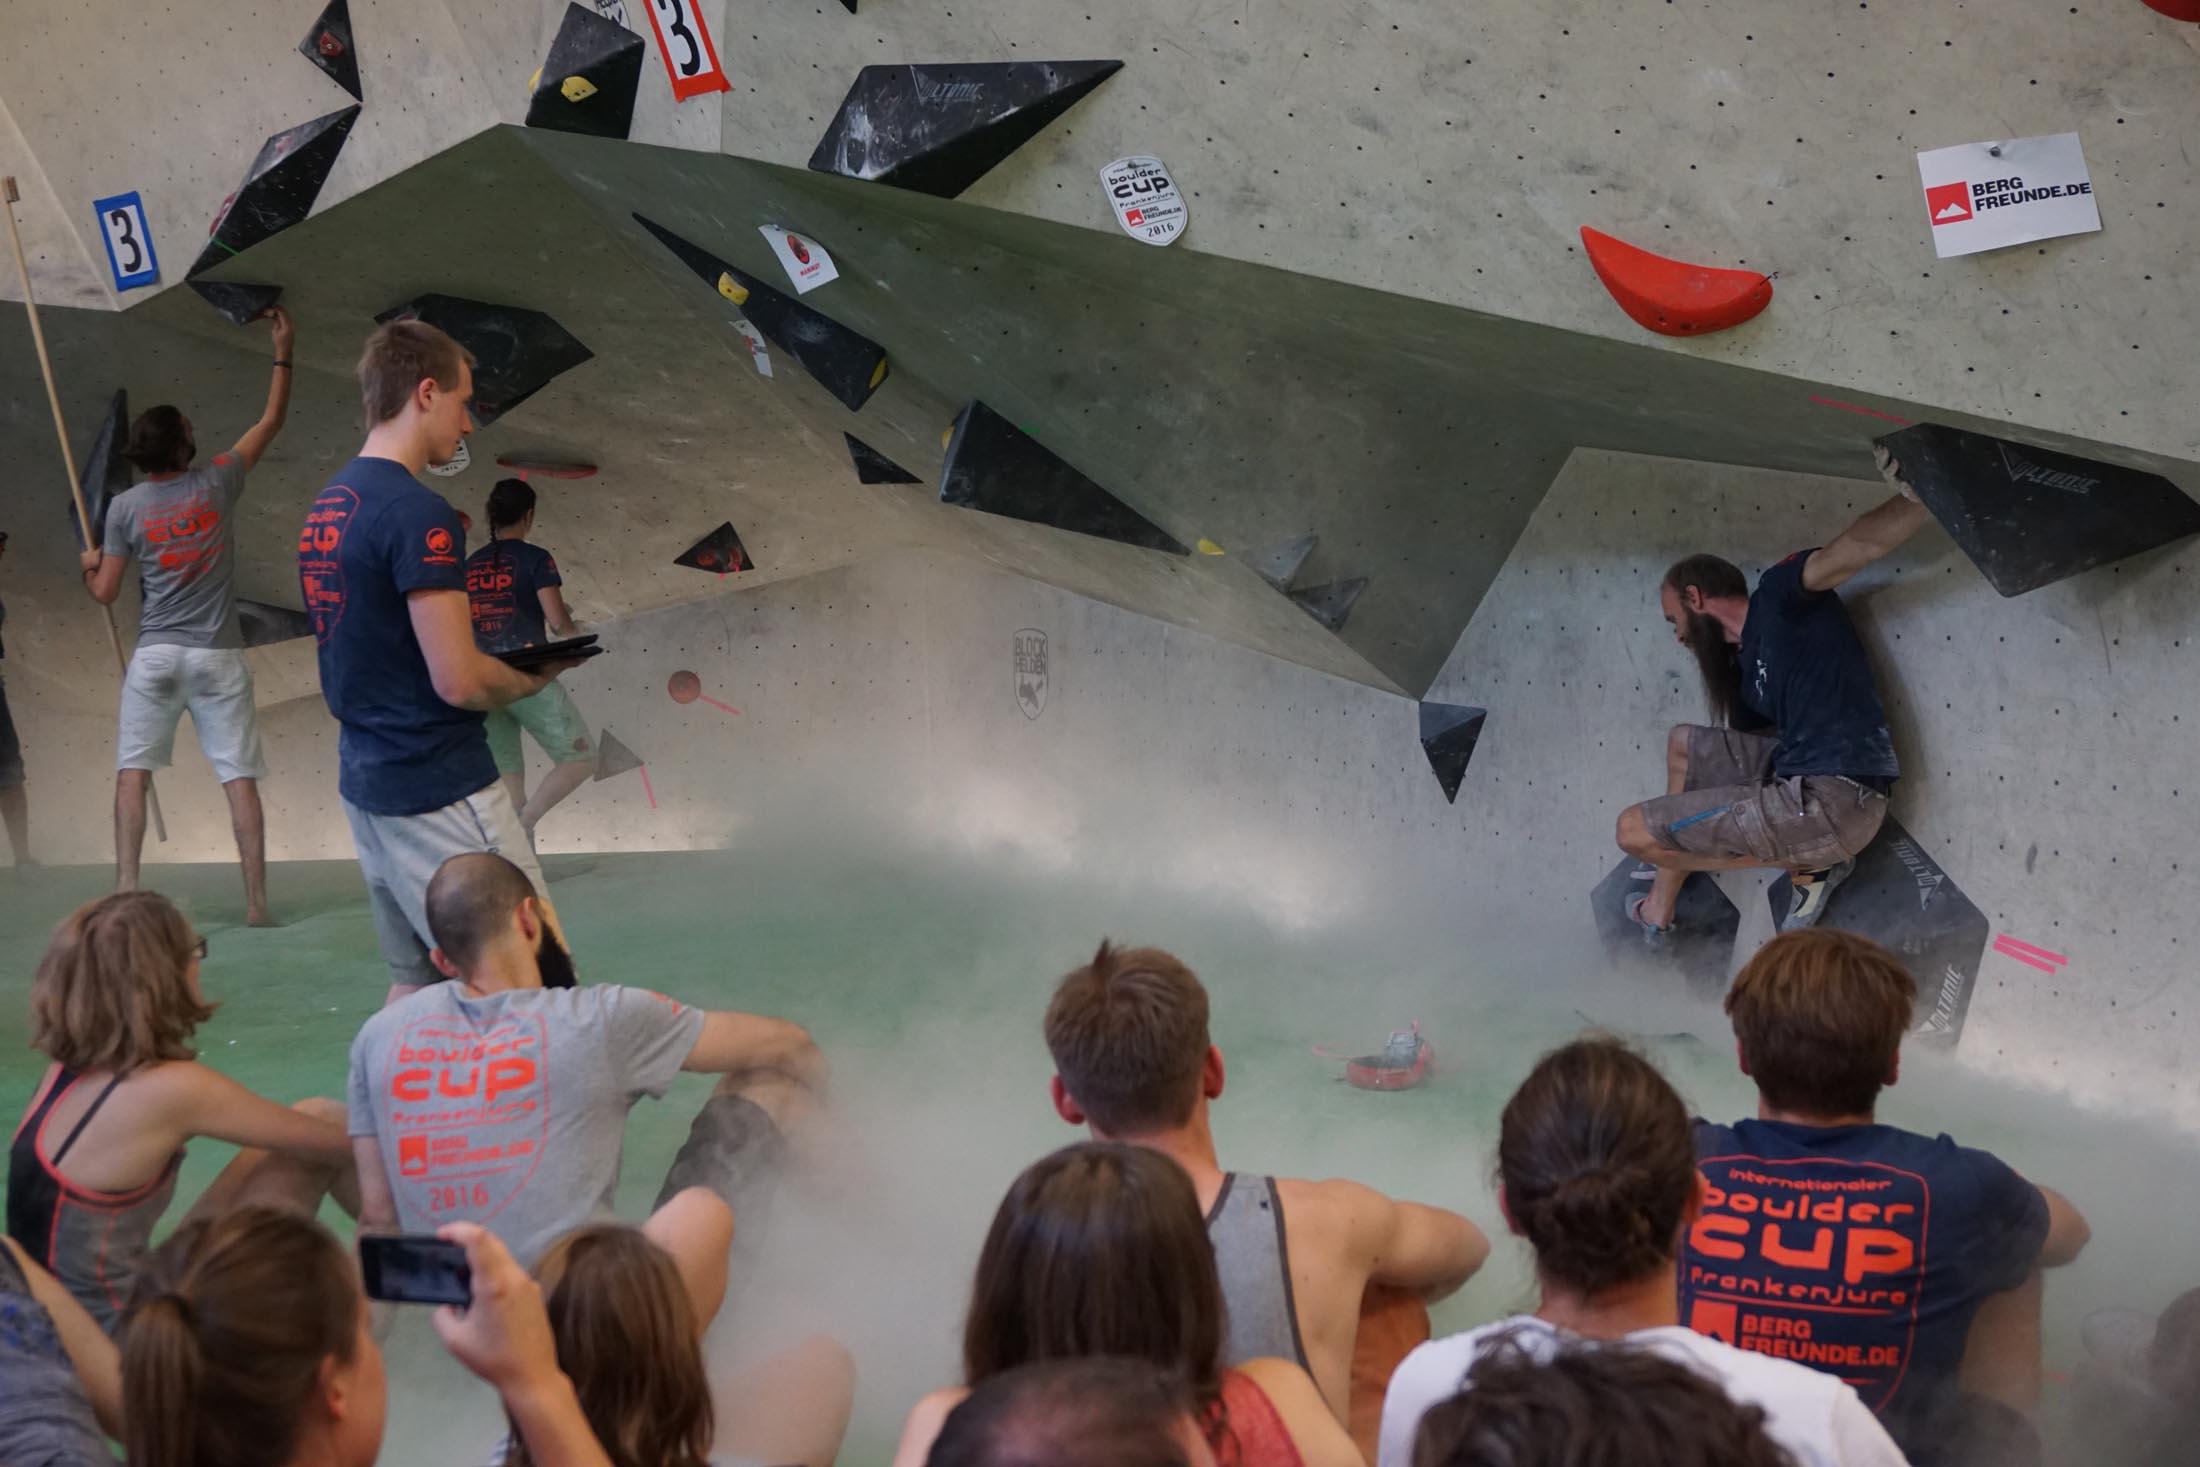 Finale, internationaler bouldercup Frankenjura 2016, BLOCKHELDEN Erlangen, Mammut, Bergfreunde.de, Boulderwettkampf07092016690